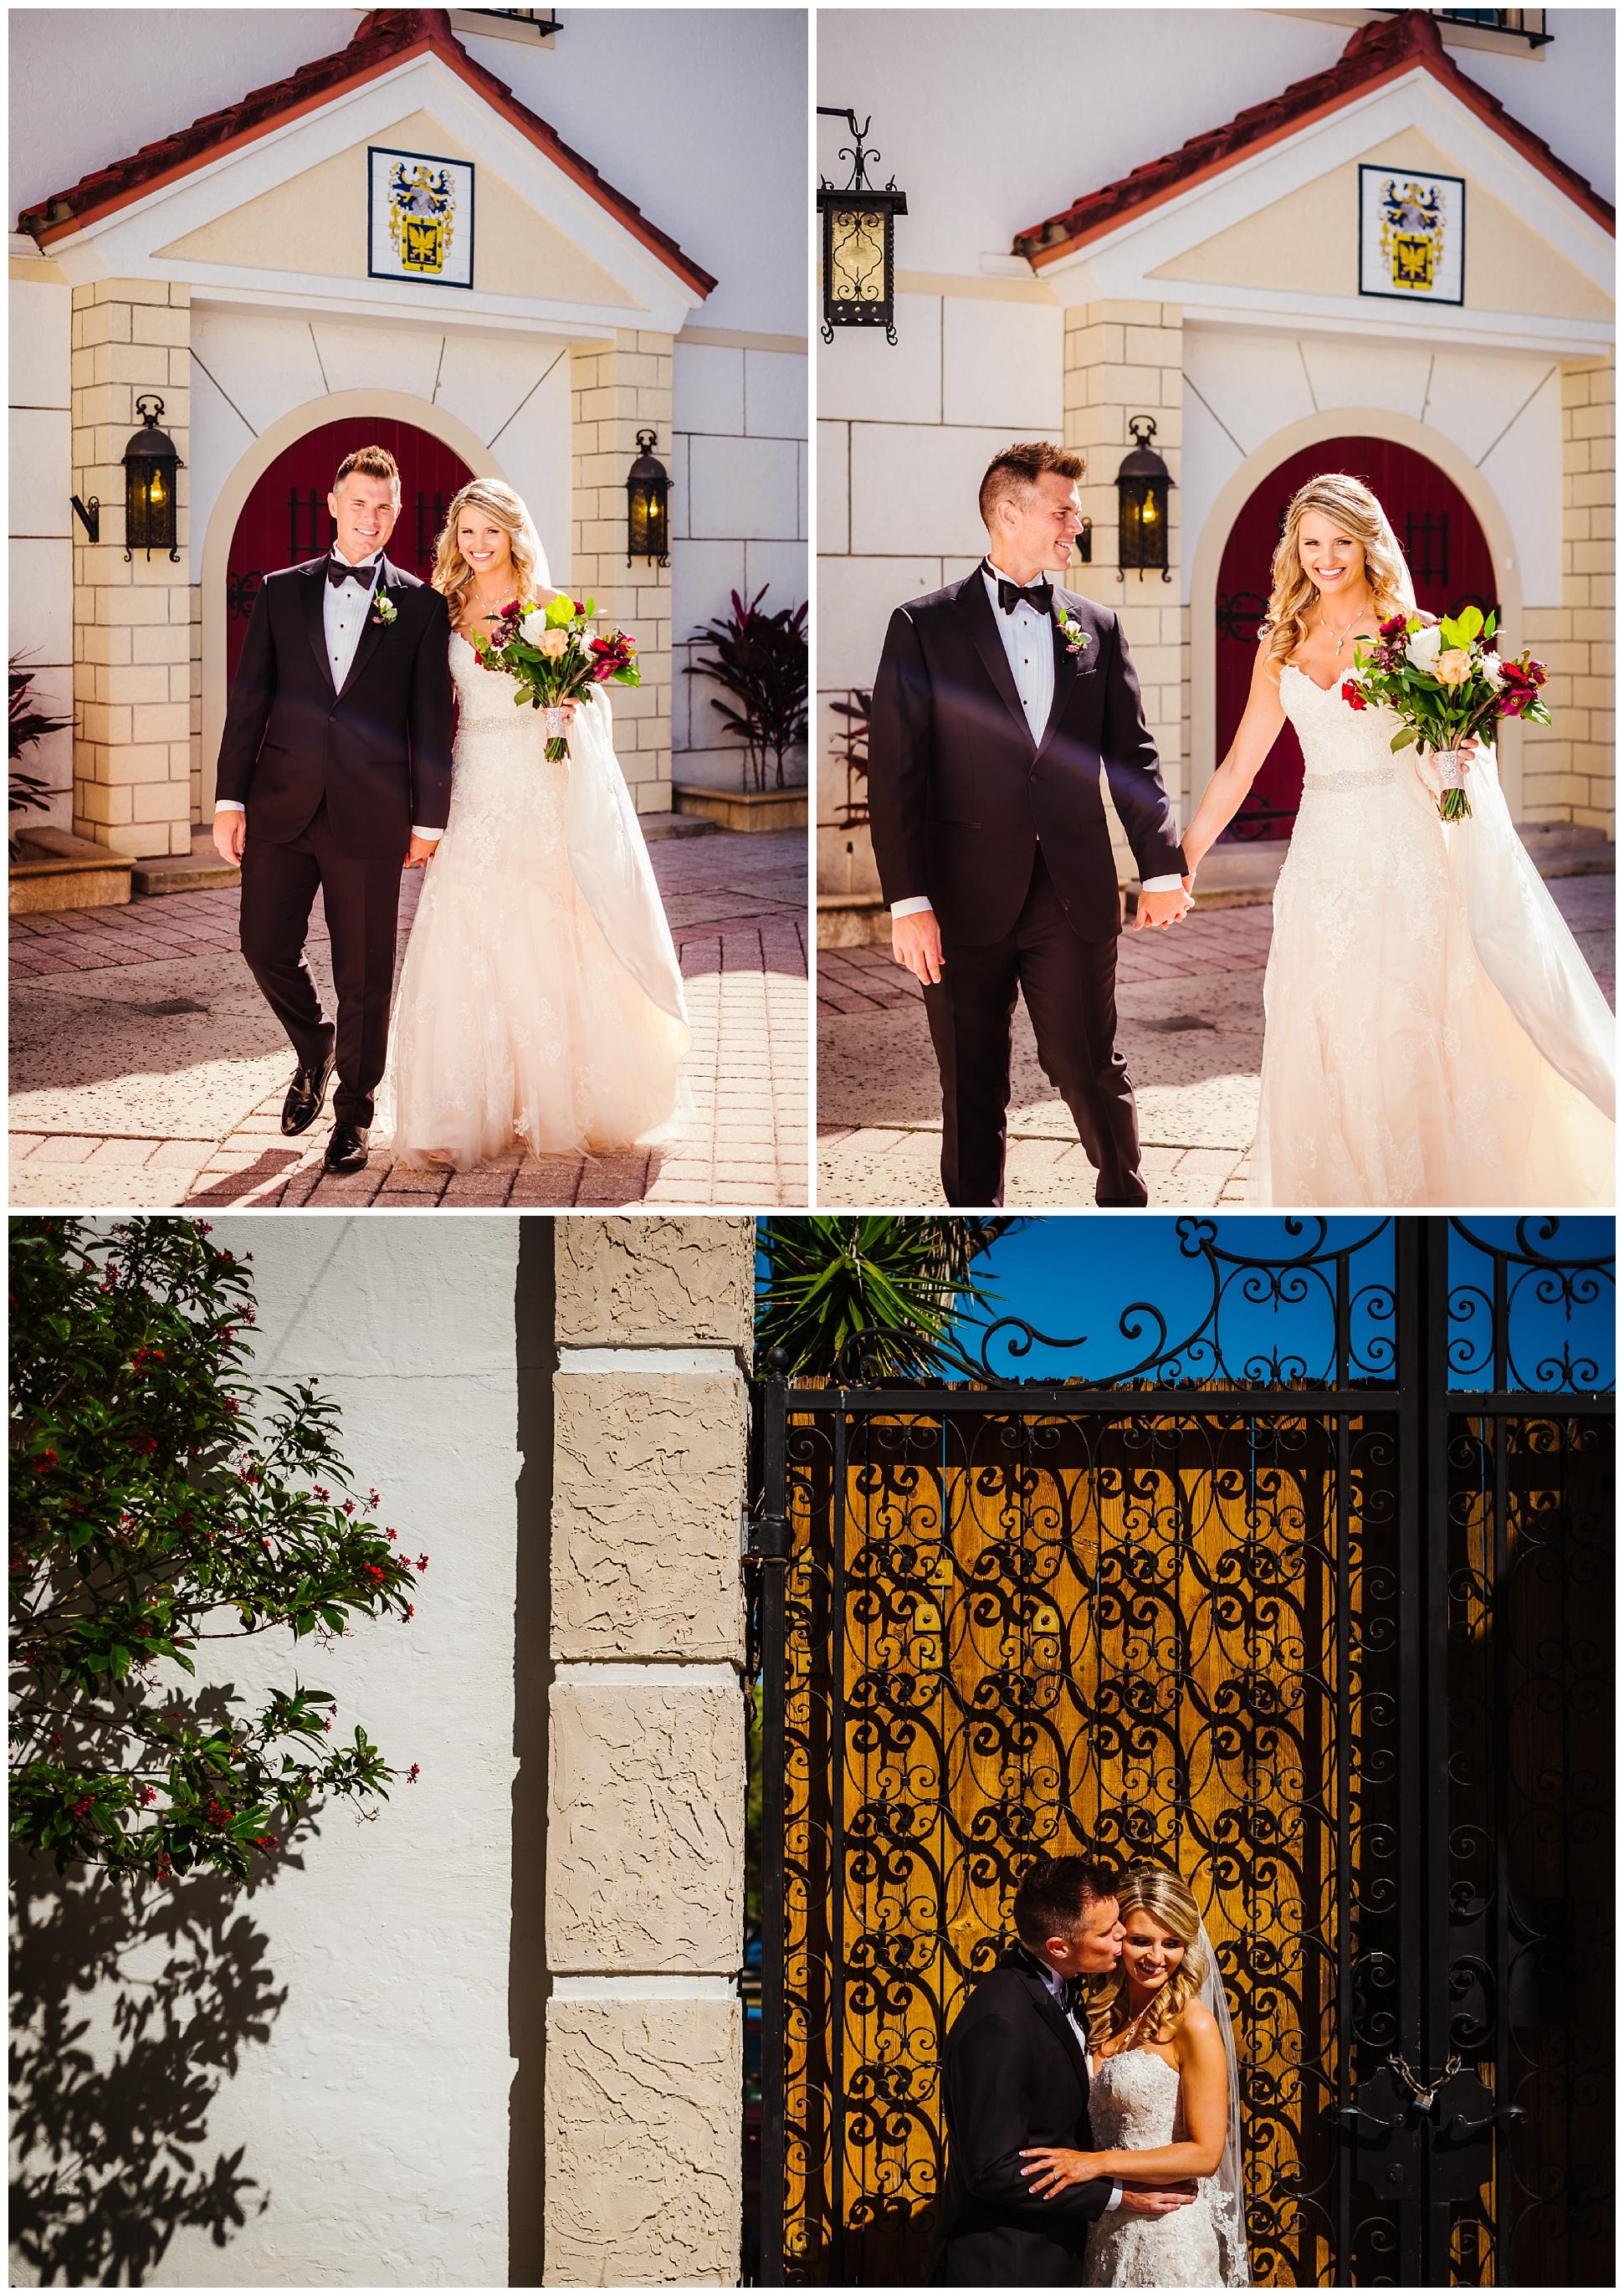 tampa-bradenton-wedding-photographer-south-florida-museum-classic-blush-gold-alpacas-sparklers_0037.jpg